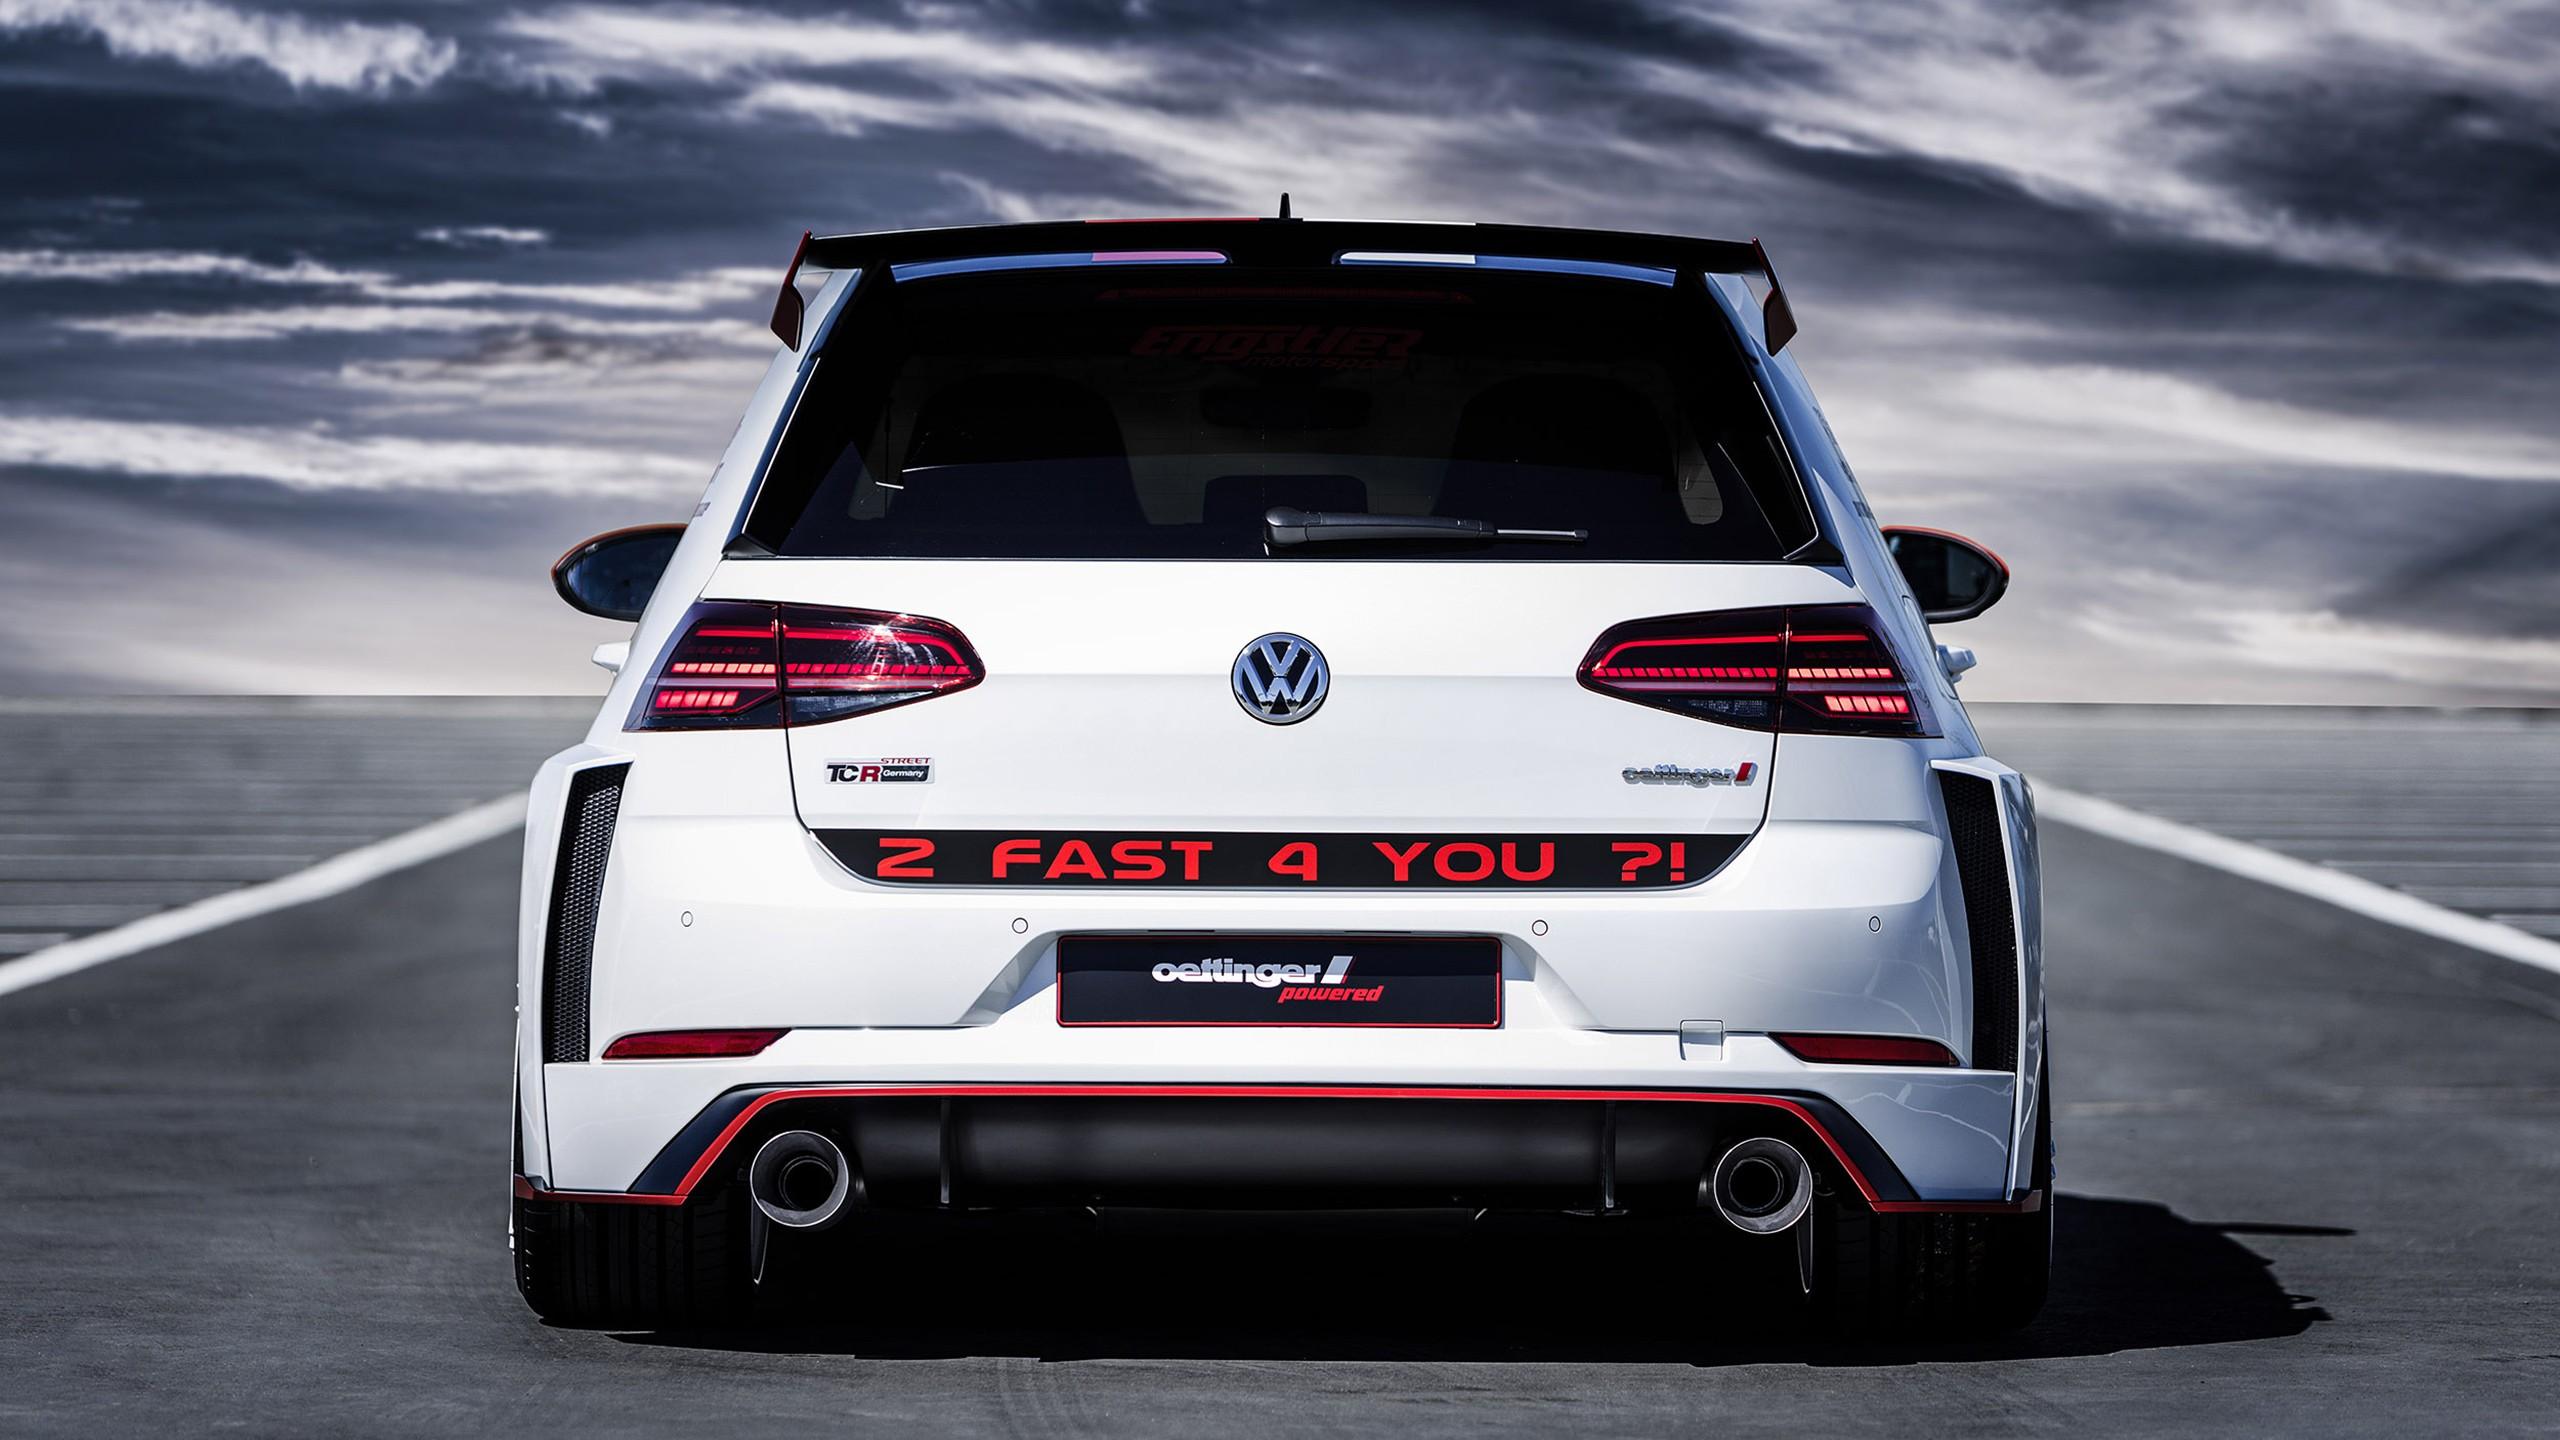 Vw Beetle Iphone Wallpaper 2018 Oettinger Volkswagen Golf Gti Tcr Germany Street 2